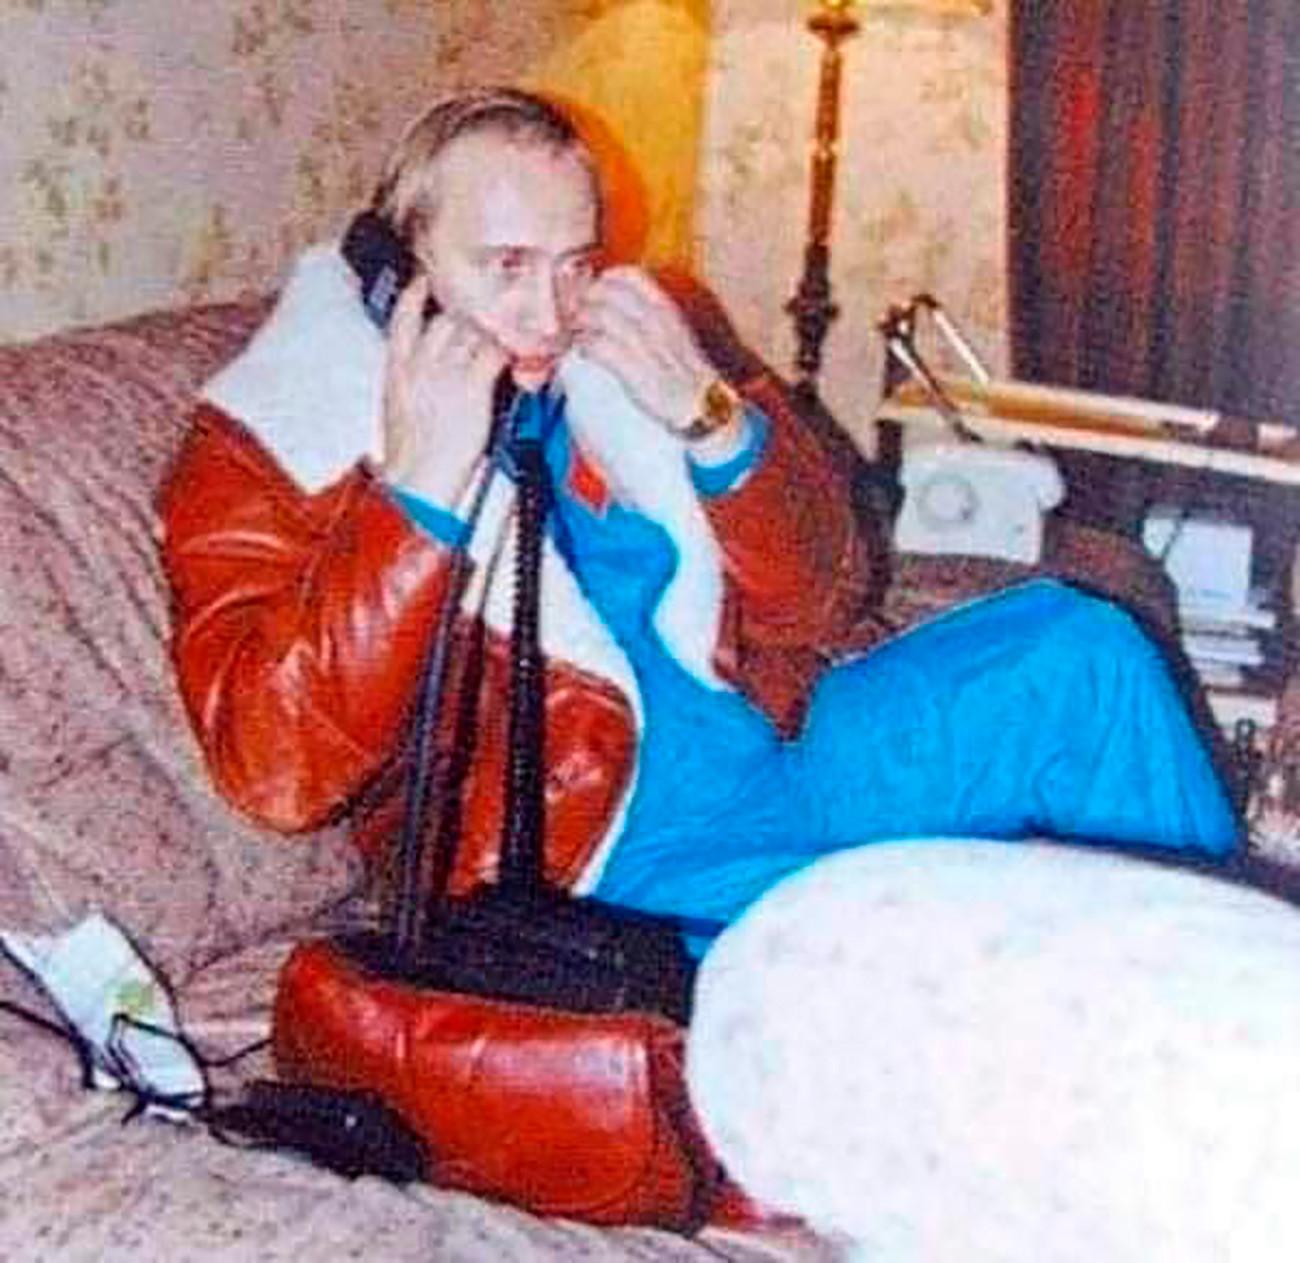 Putin in a brown sheepskin coat.